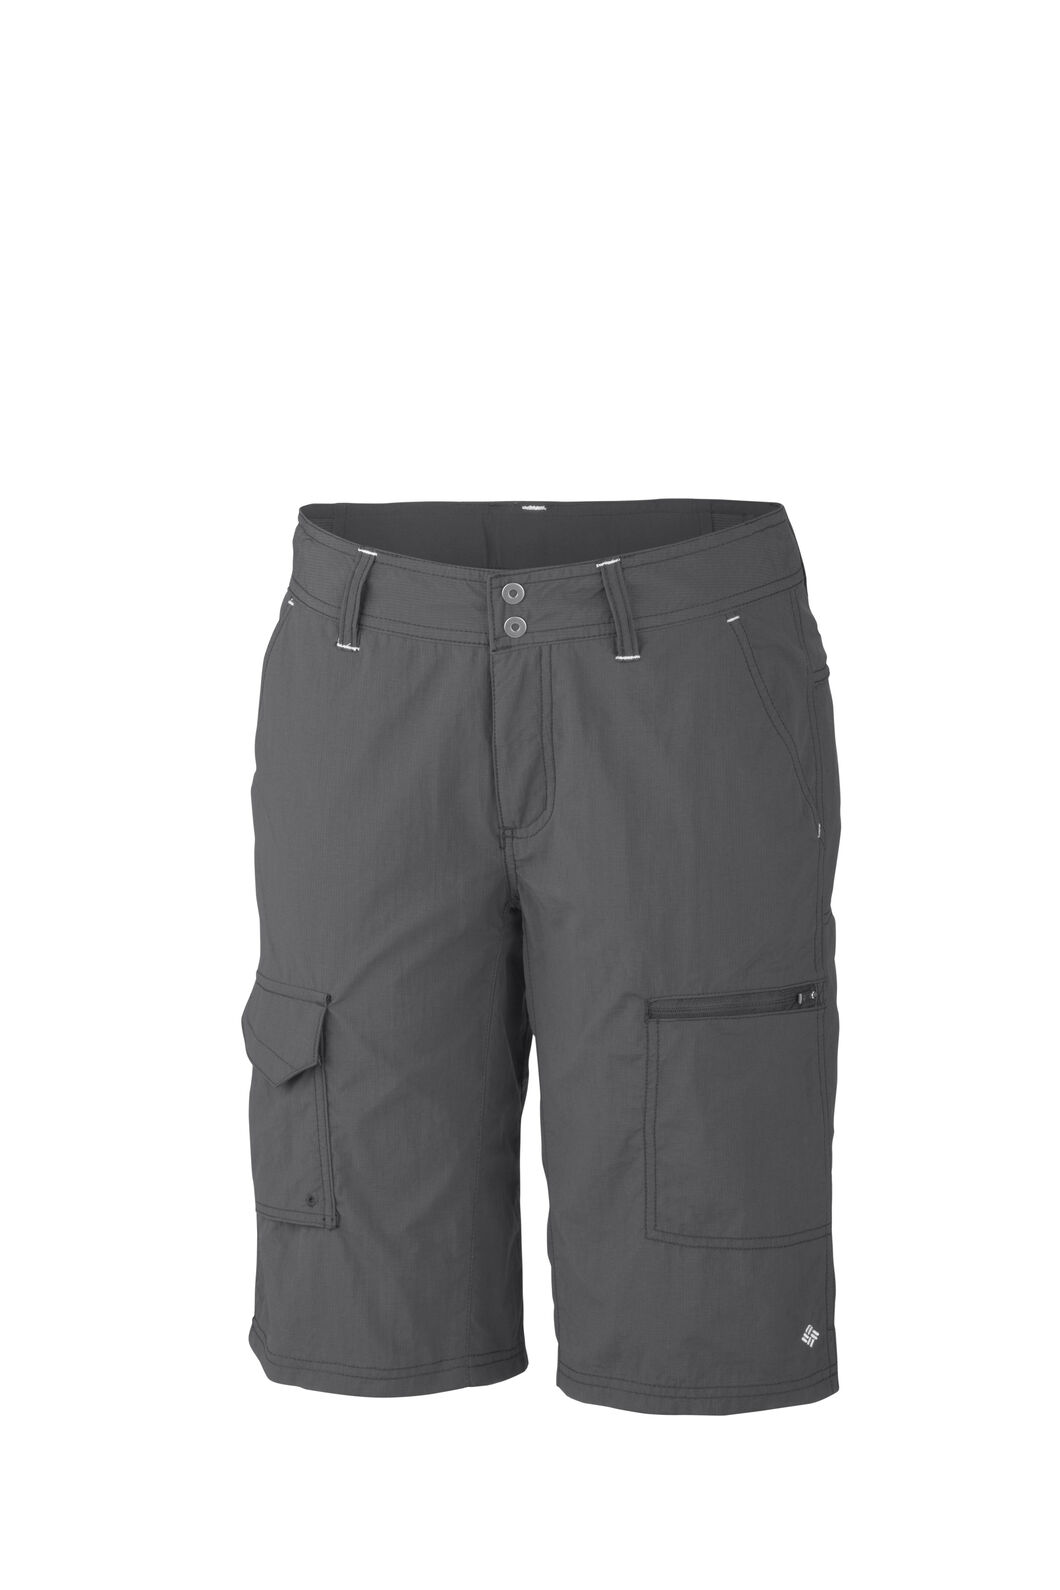 Columbia Silver Ridge™ Cargo Shorts — Women's, Grill, hi-res